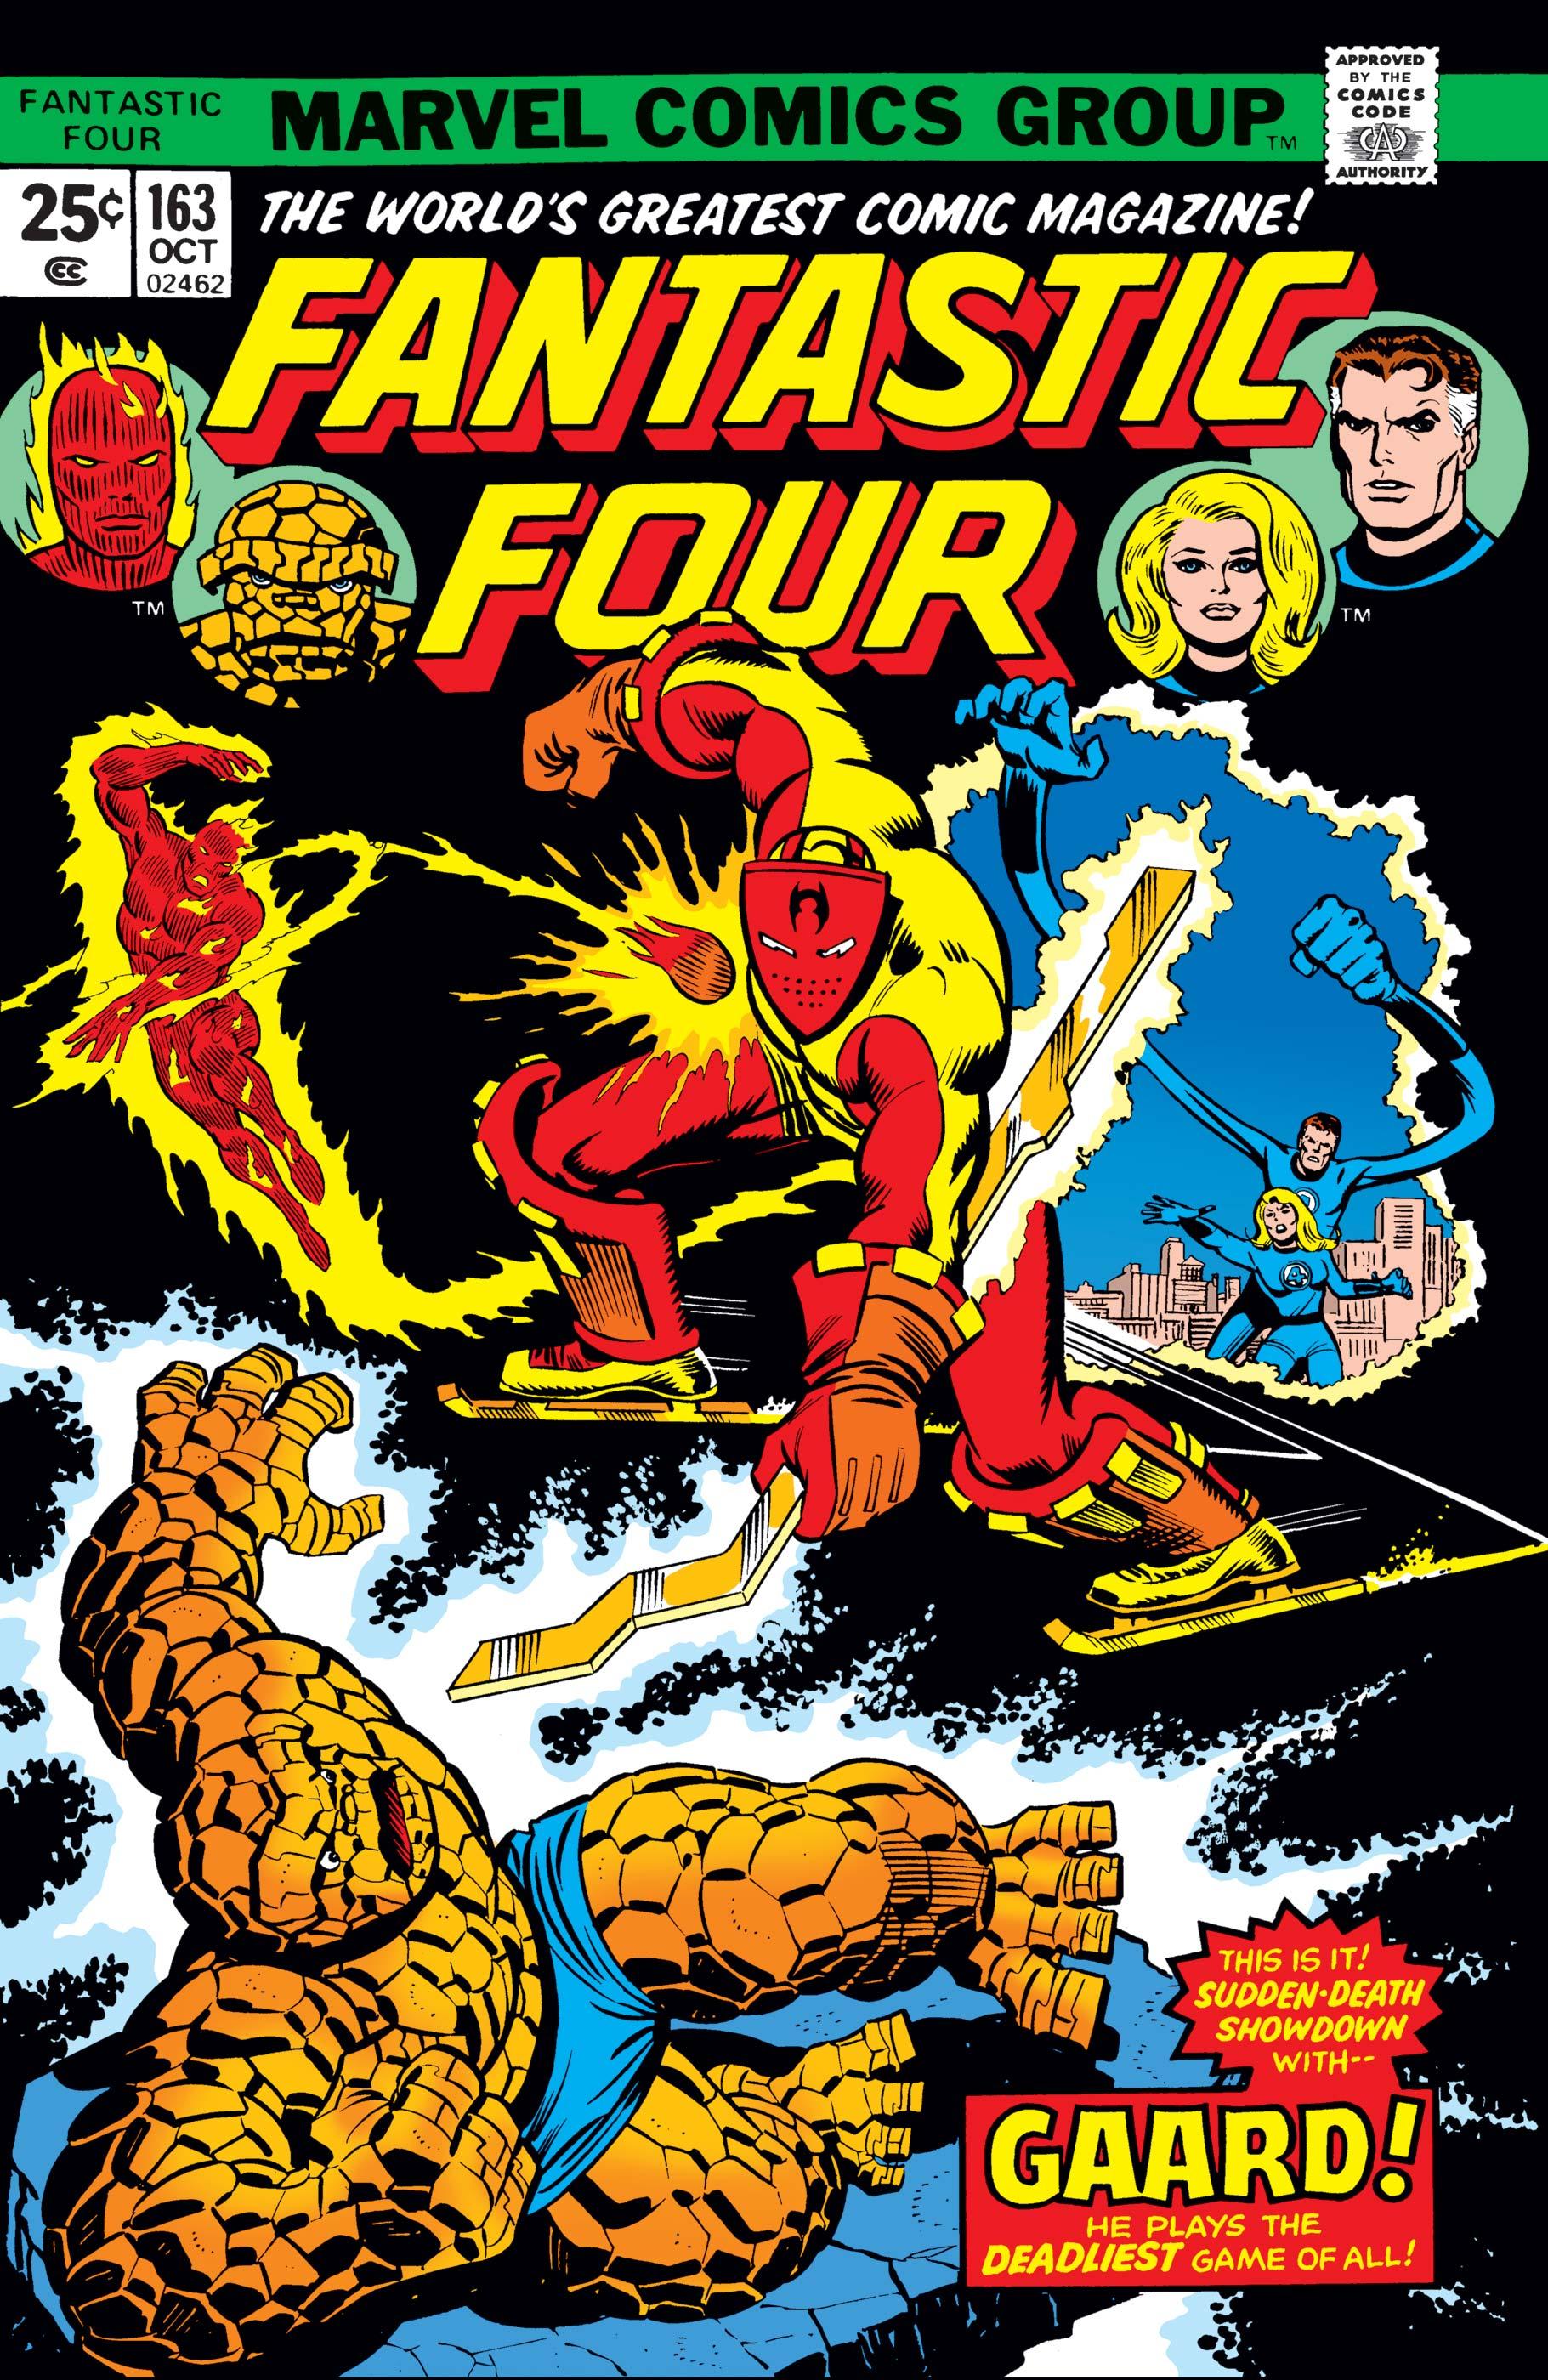 Fantastic Four (1961) #163